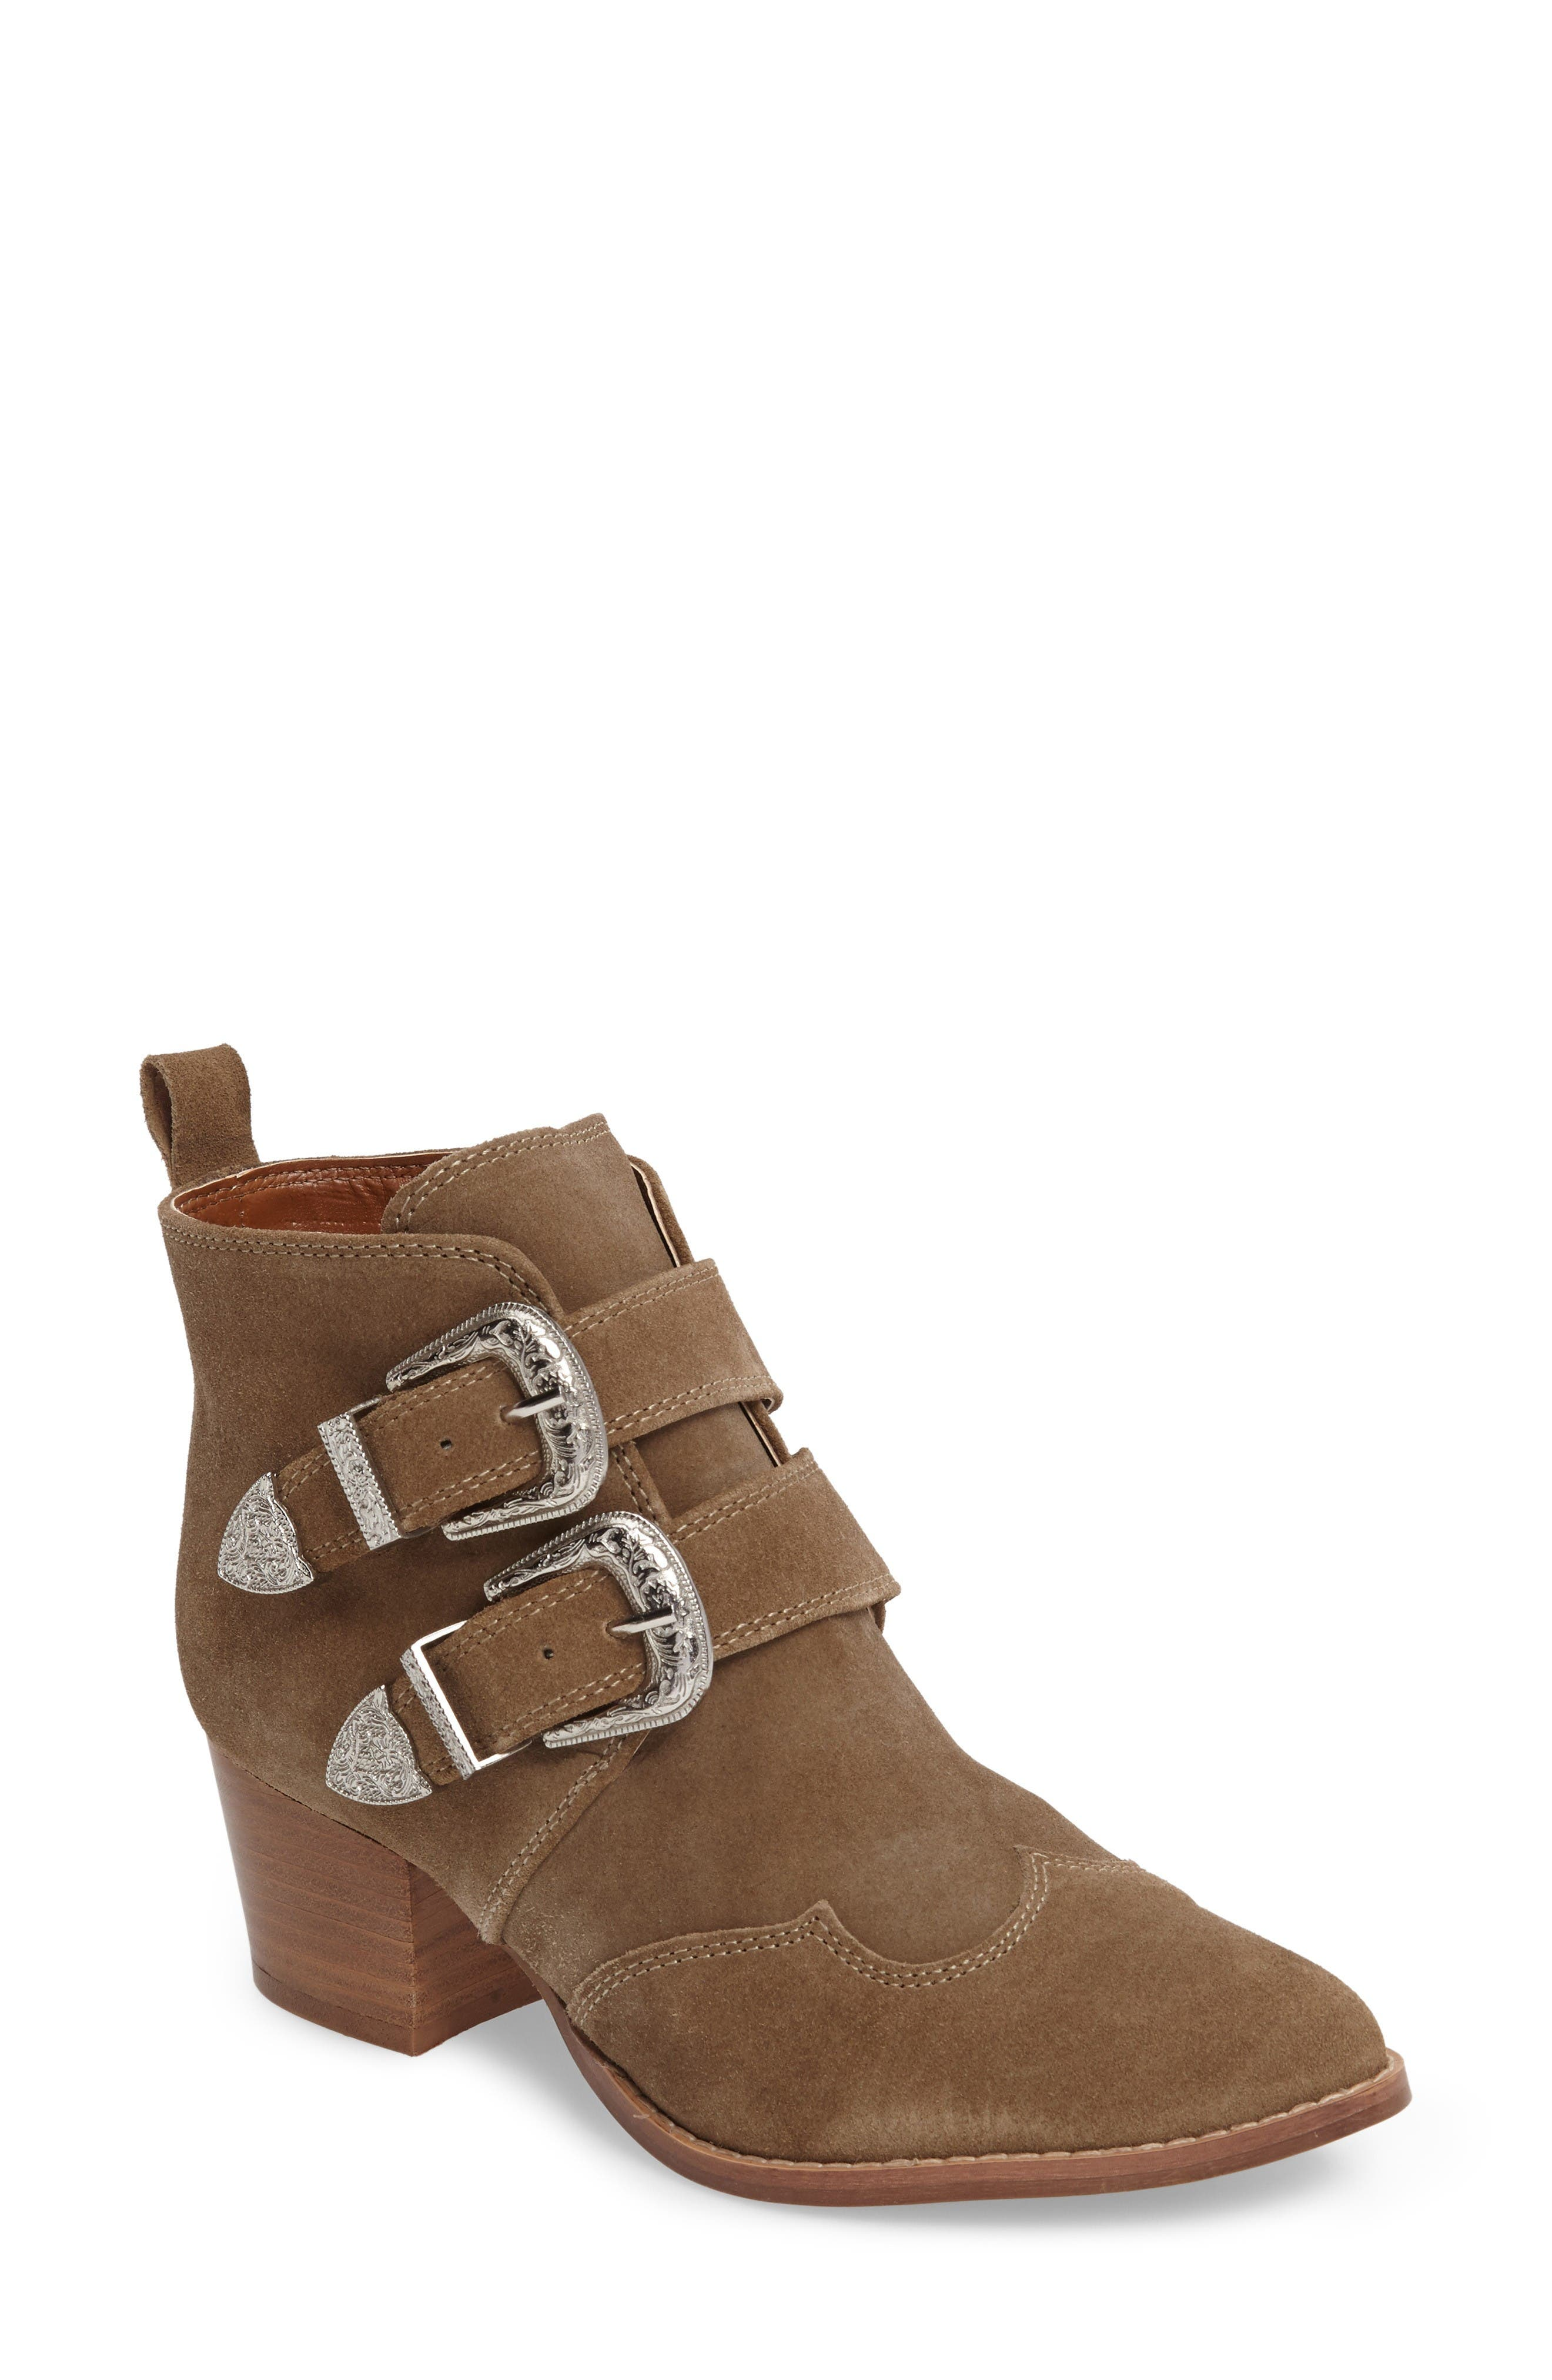 Alternate Image 1 Selected - Topshop Montana Boot (Women)